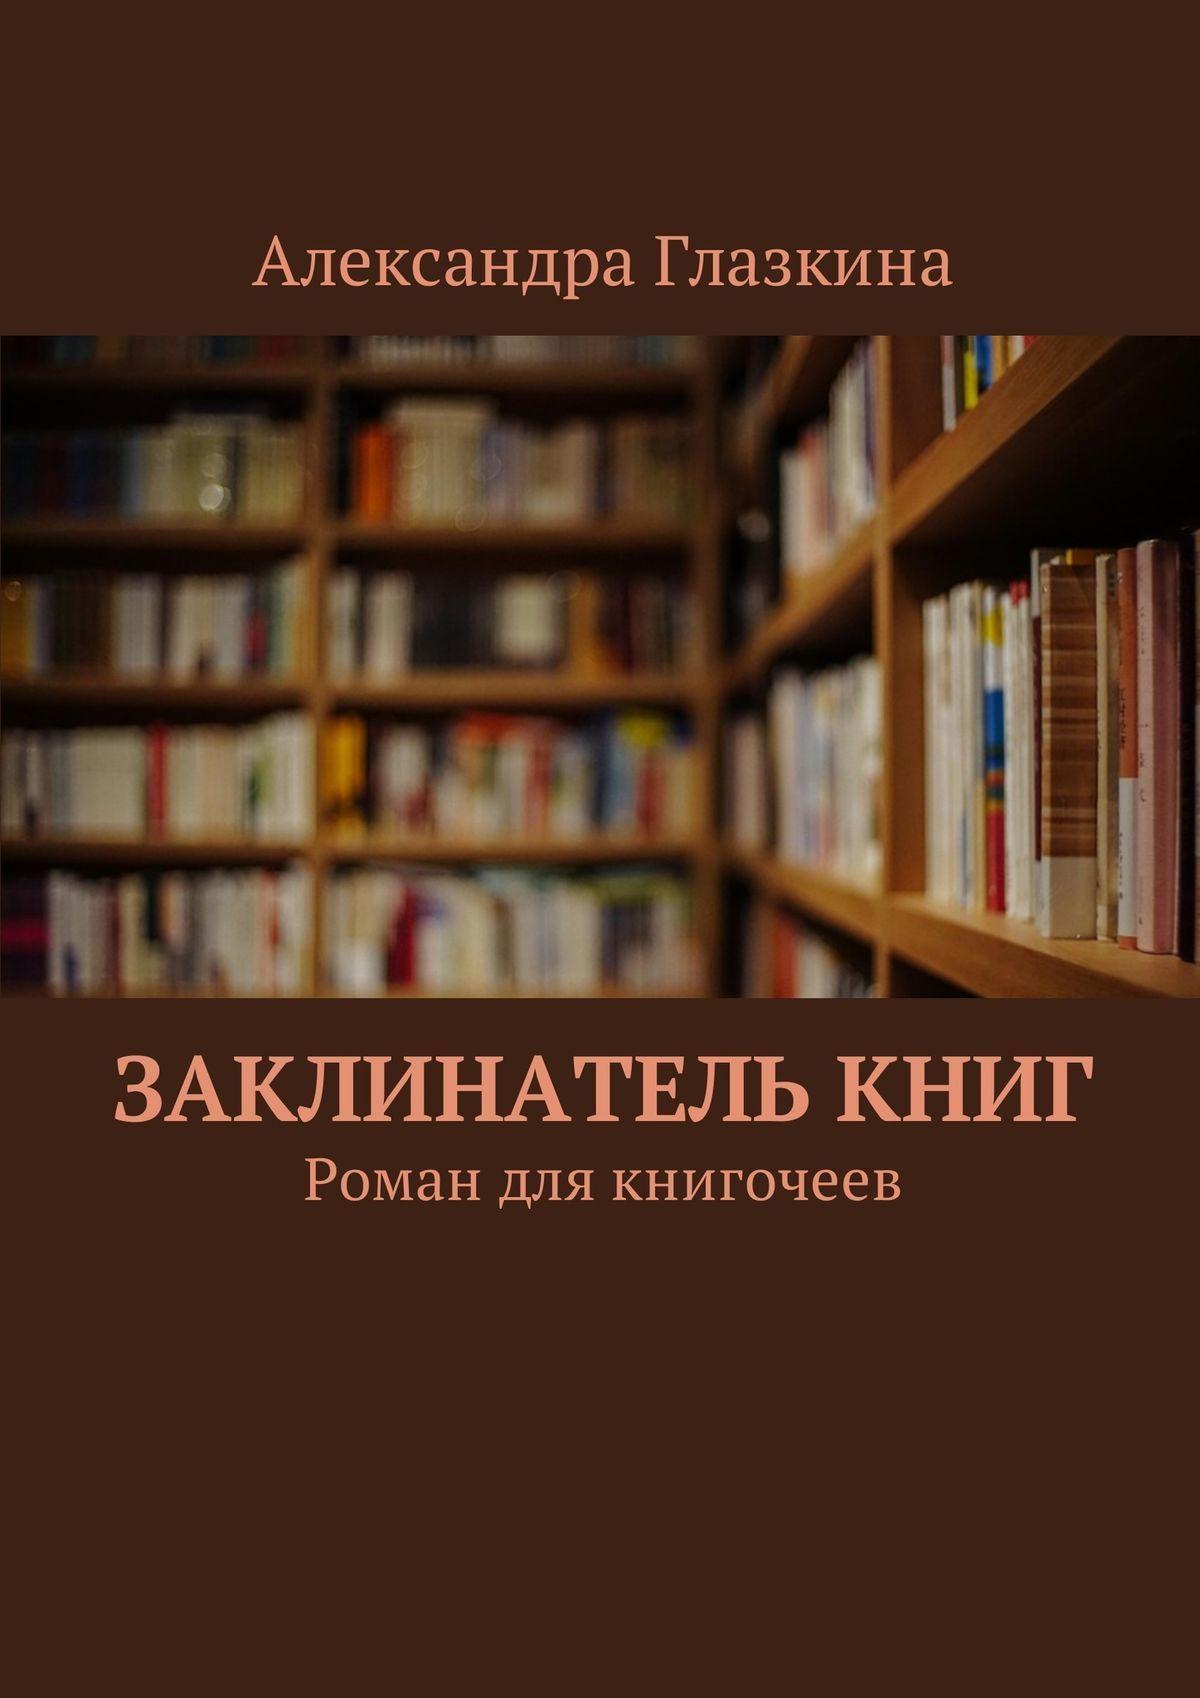 Александра Глазкина бесплатно